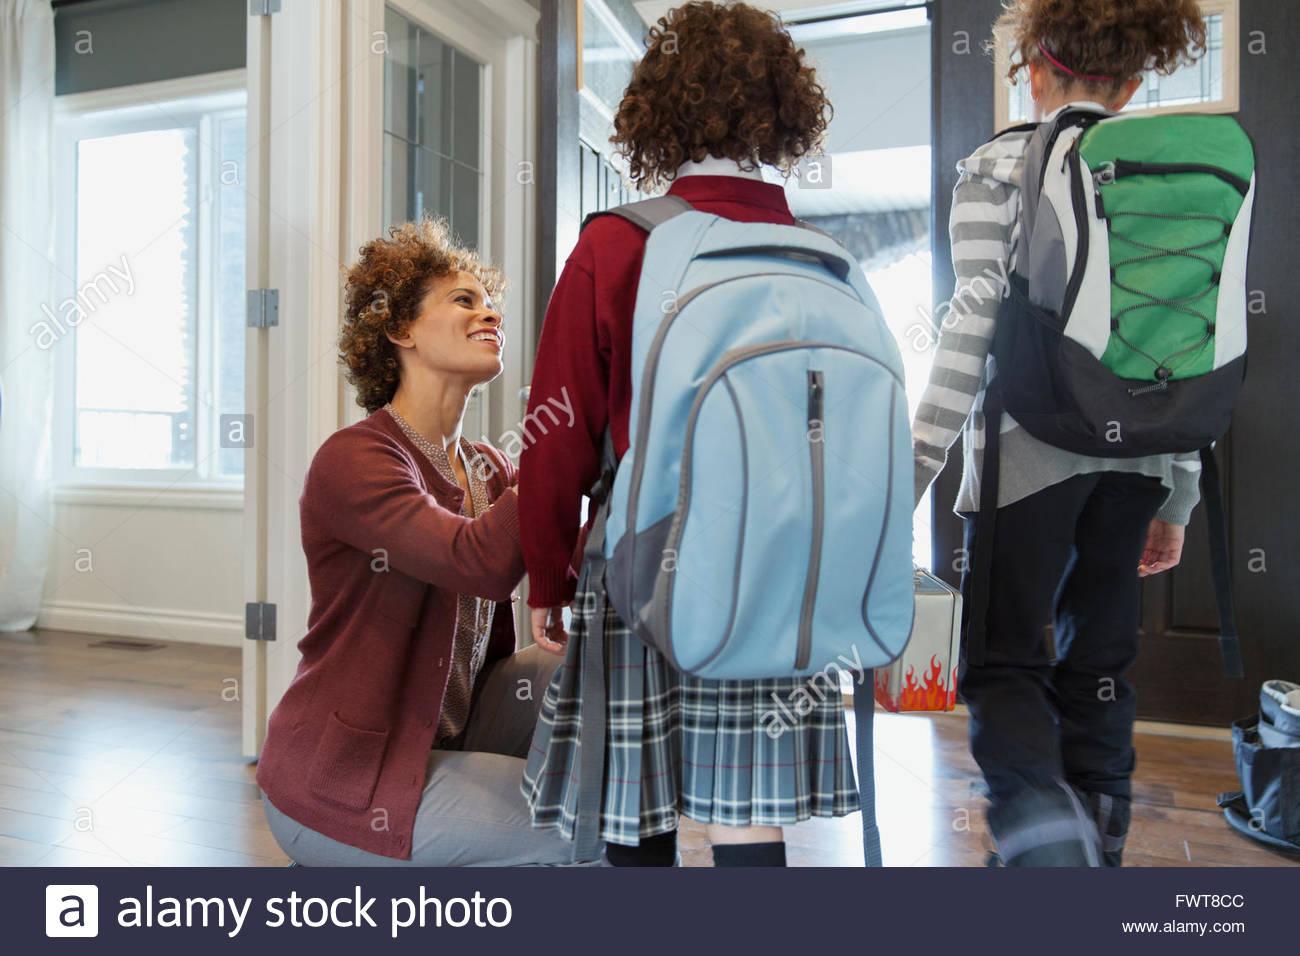 Mother sending daughters off to school. - Stock Image